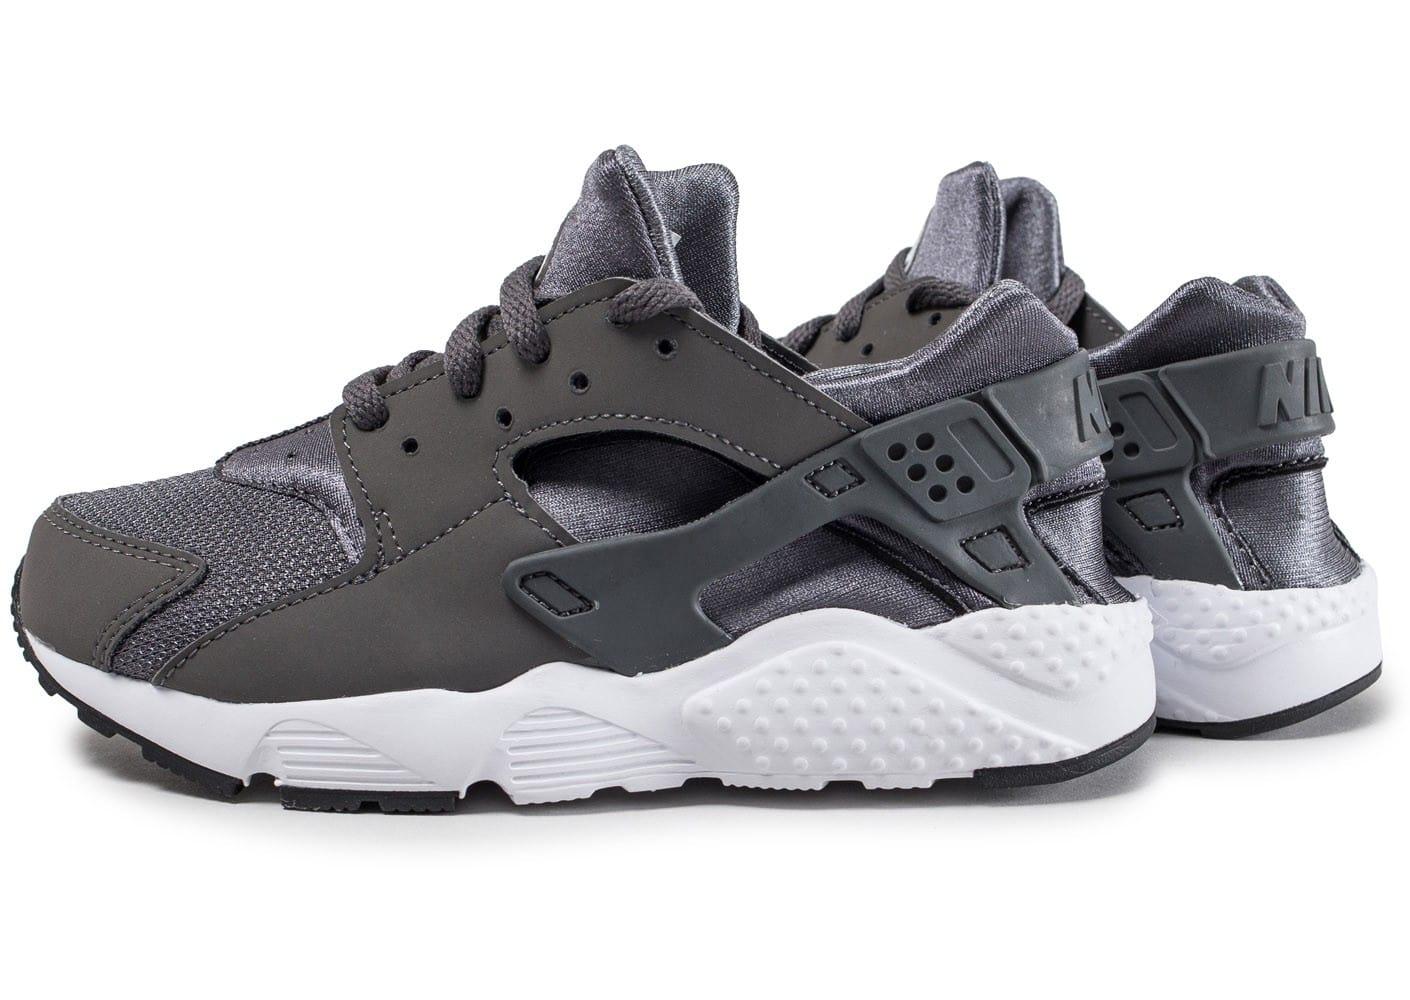 uk availability a4522 ffe31 basket enfant nike huarache, Cliquez pour zoomer Chaussures Nike Air  Huarache Run enfant anthracite vue